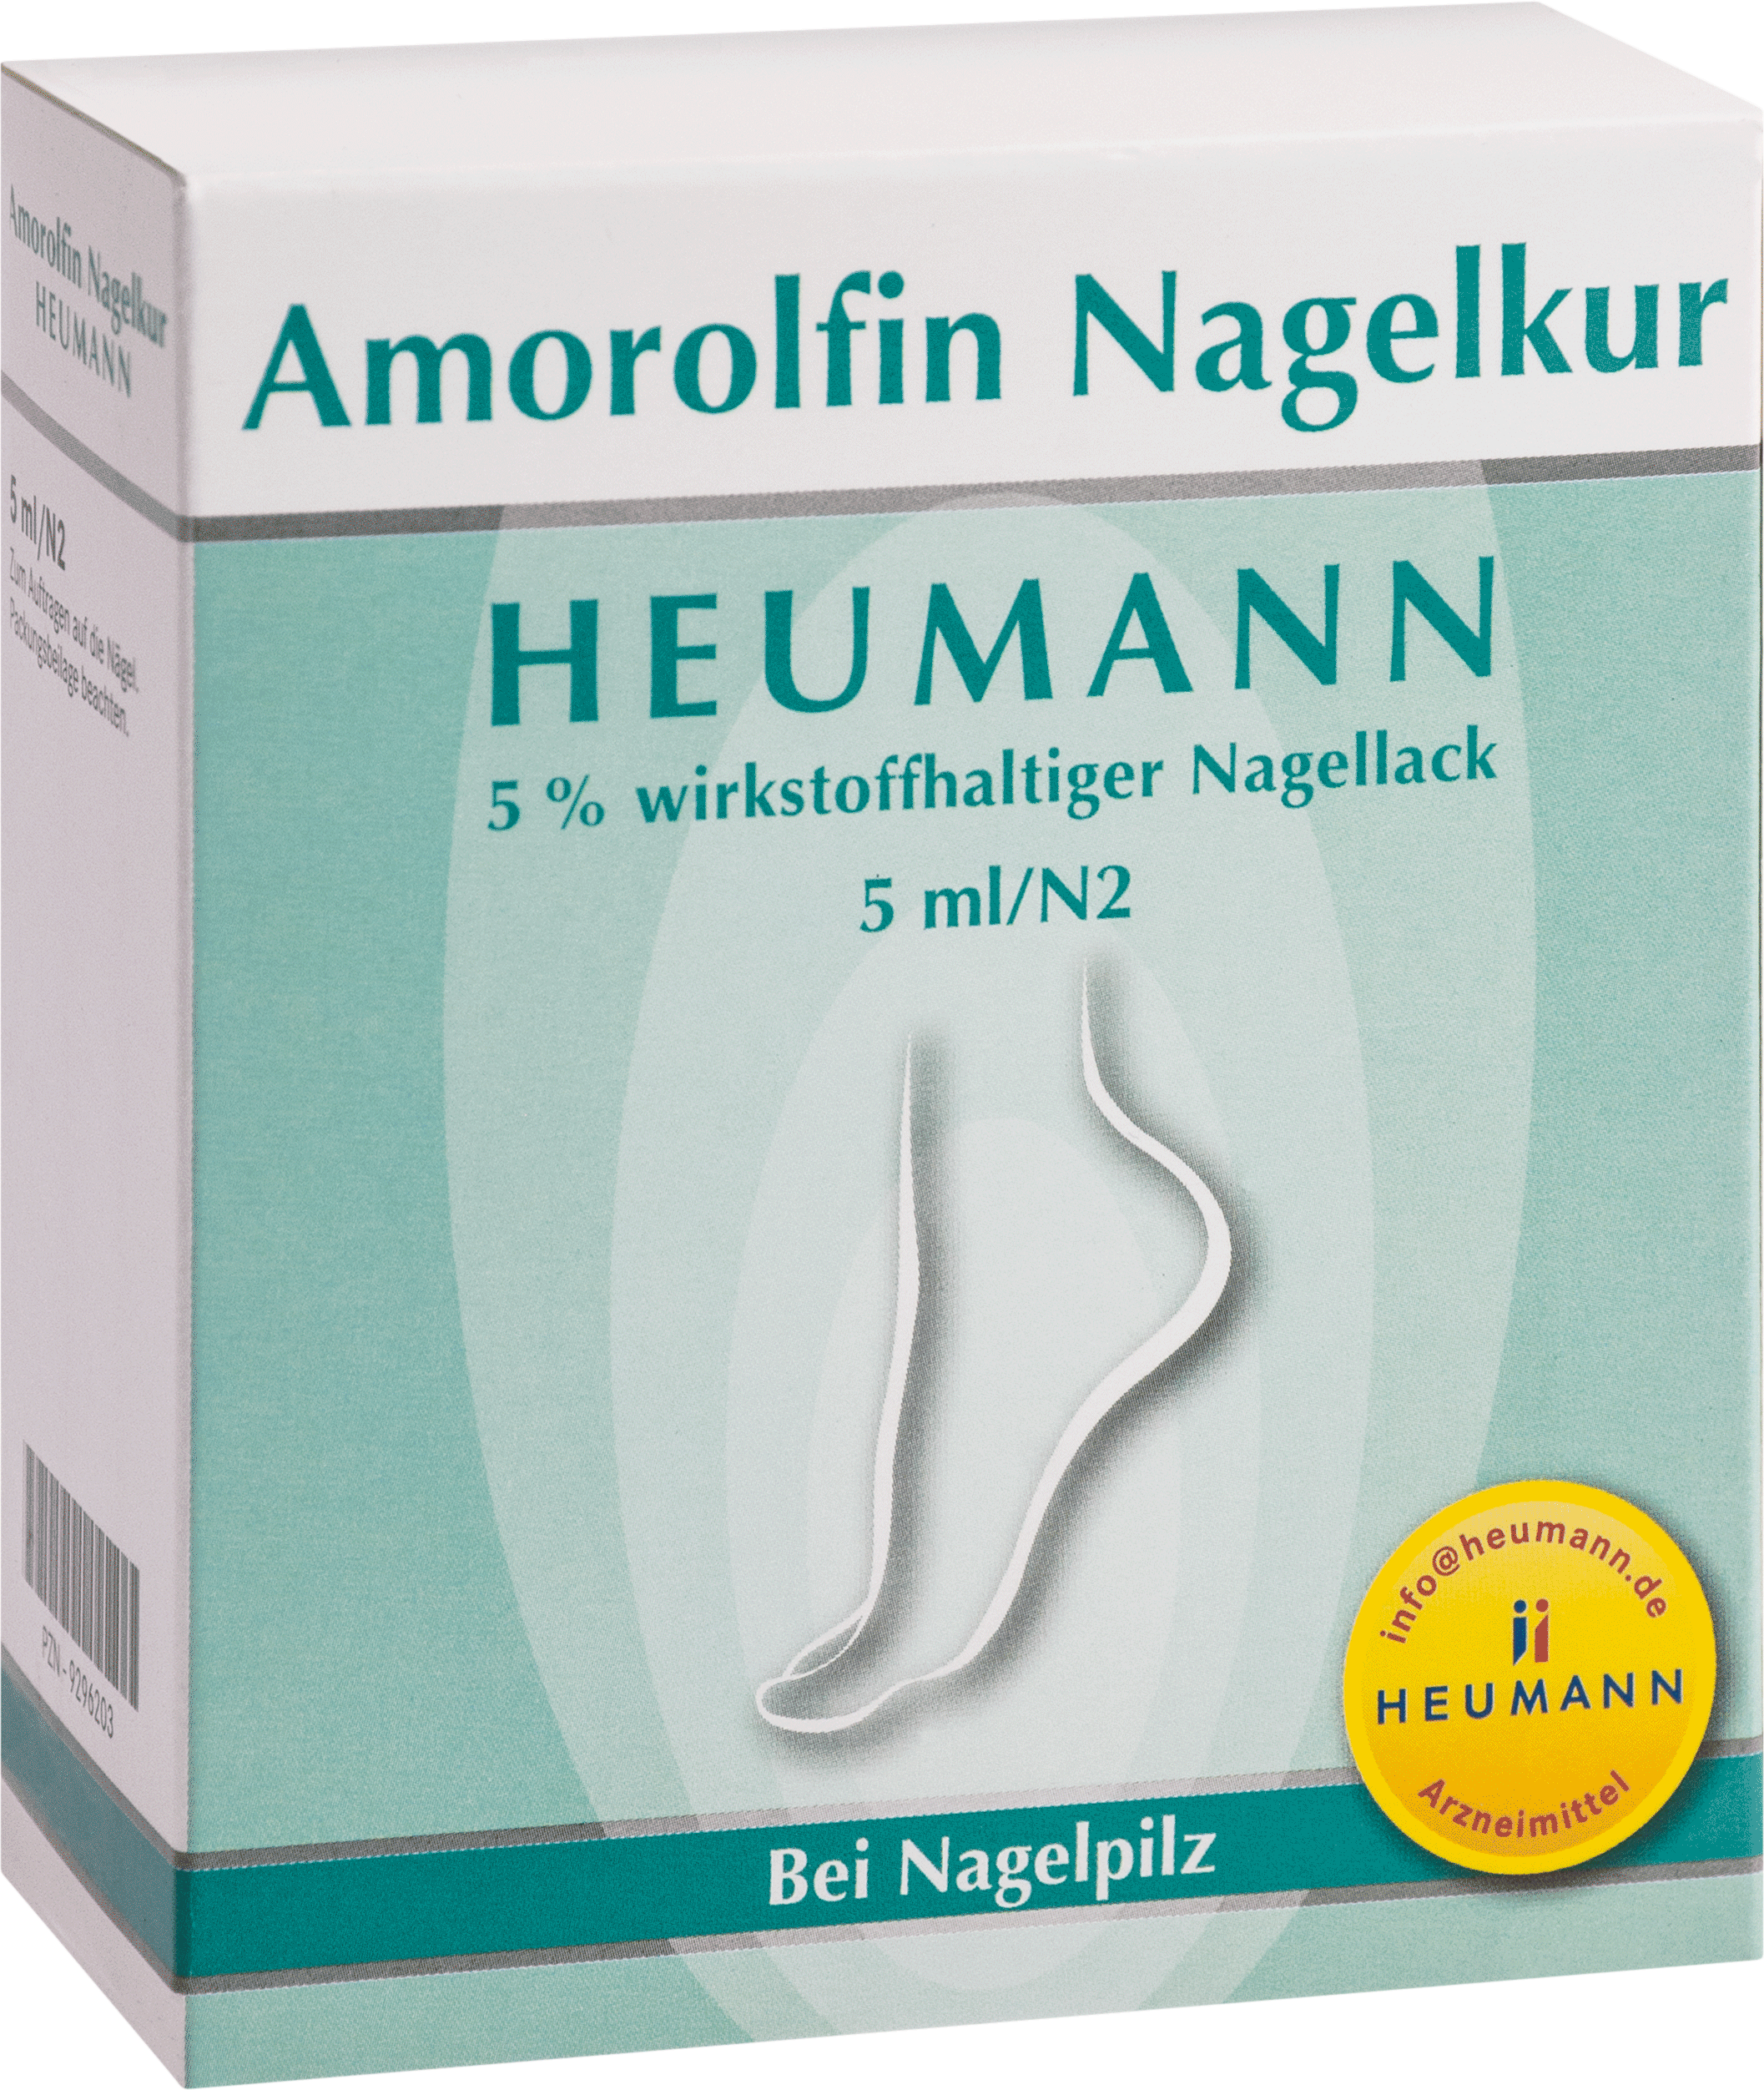 Amorolfin Nagelkur Heumann 5% wirkstoffh.Nagellack